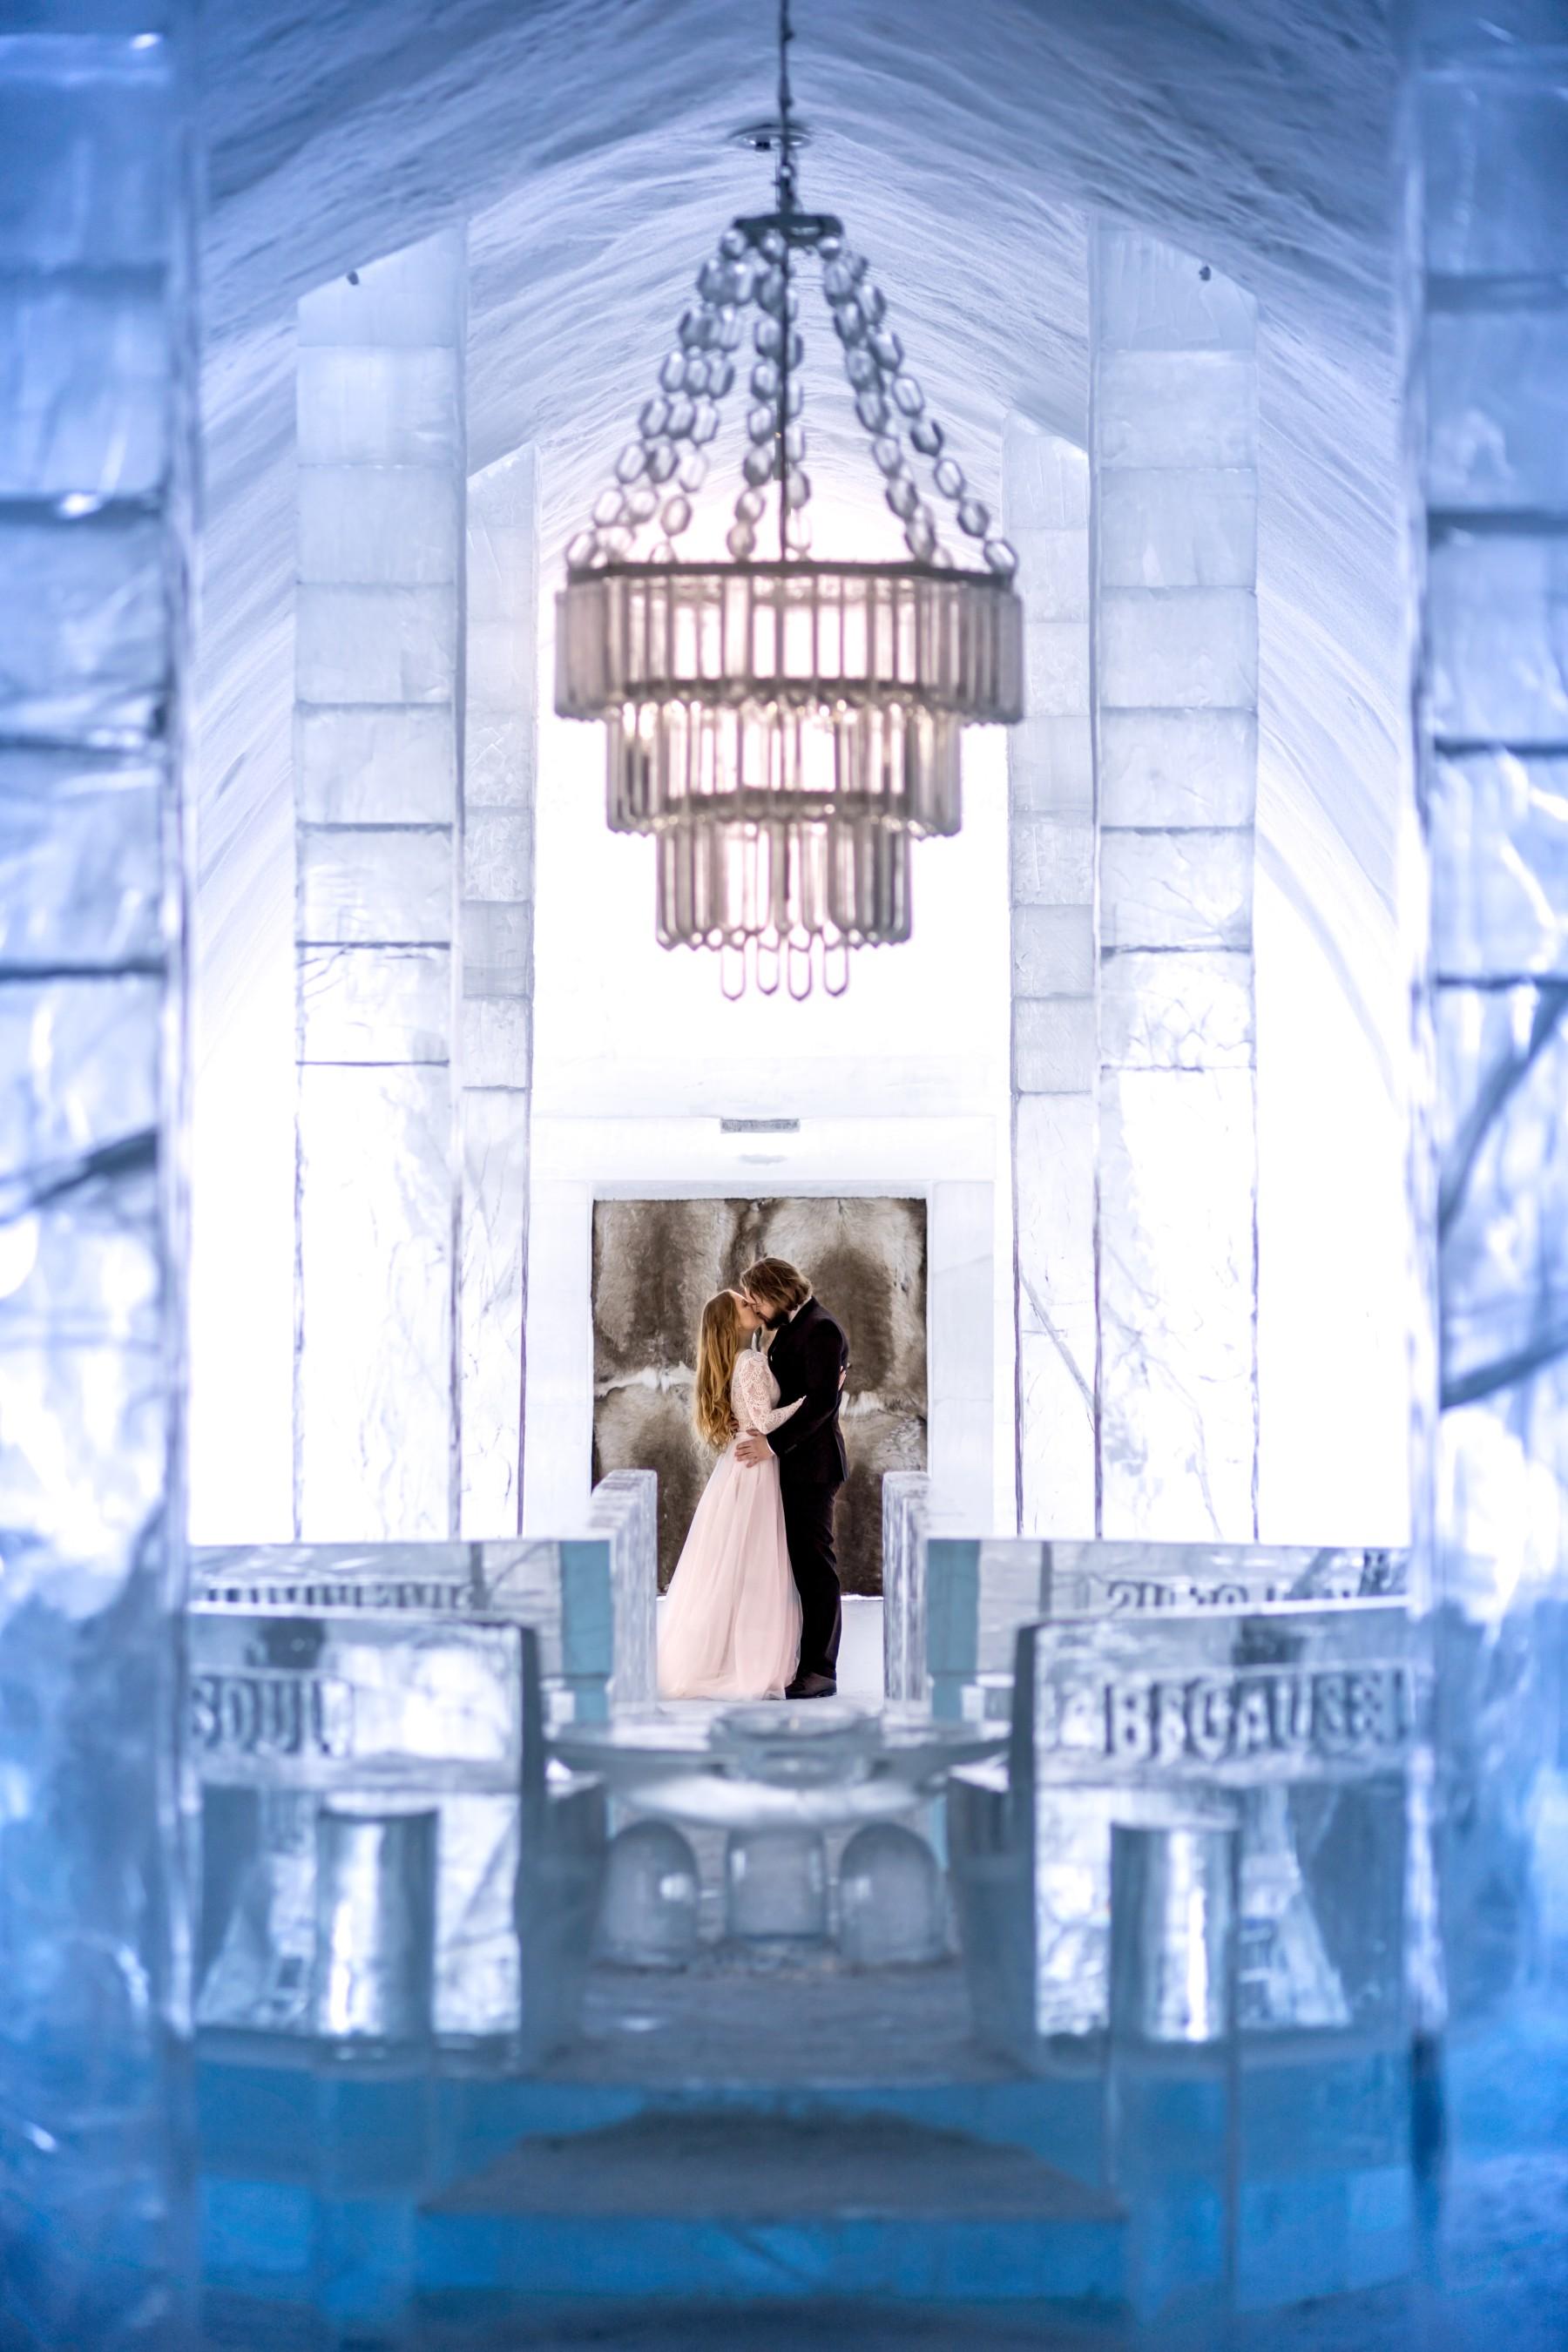 winter wedding at icehotel sweden - cinematic wedding photography - ice wedding - elopement in sweden - creative wedding photographer - unconventional wedding - alternative wedding - unique wedding - artistic wedding - bride and groom kiss